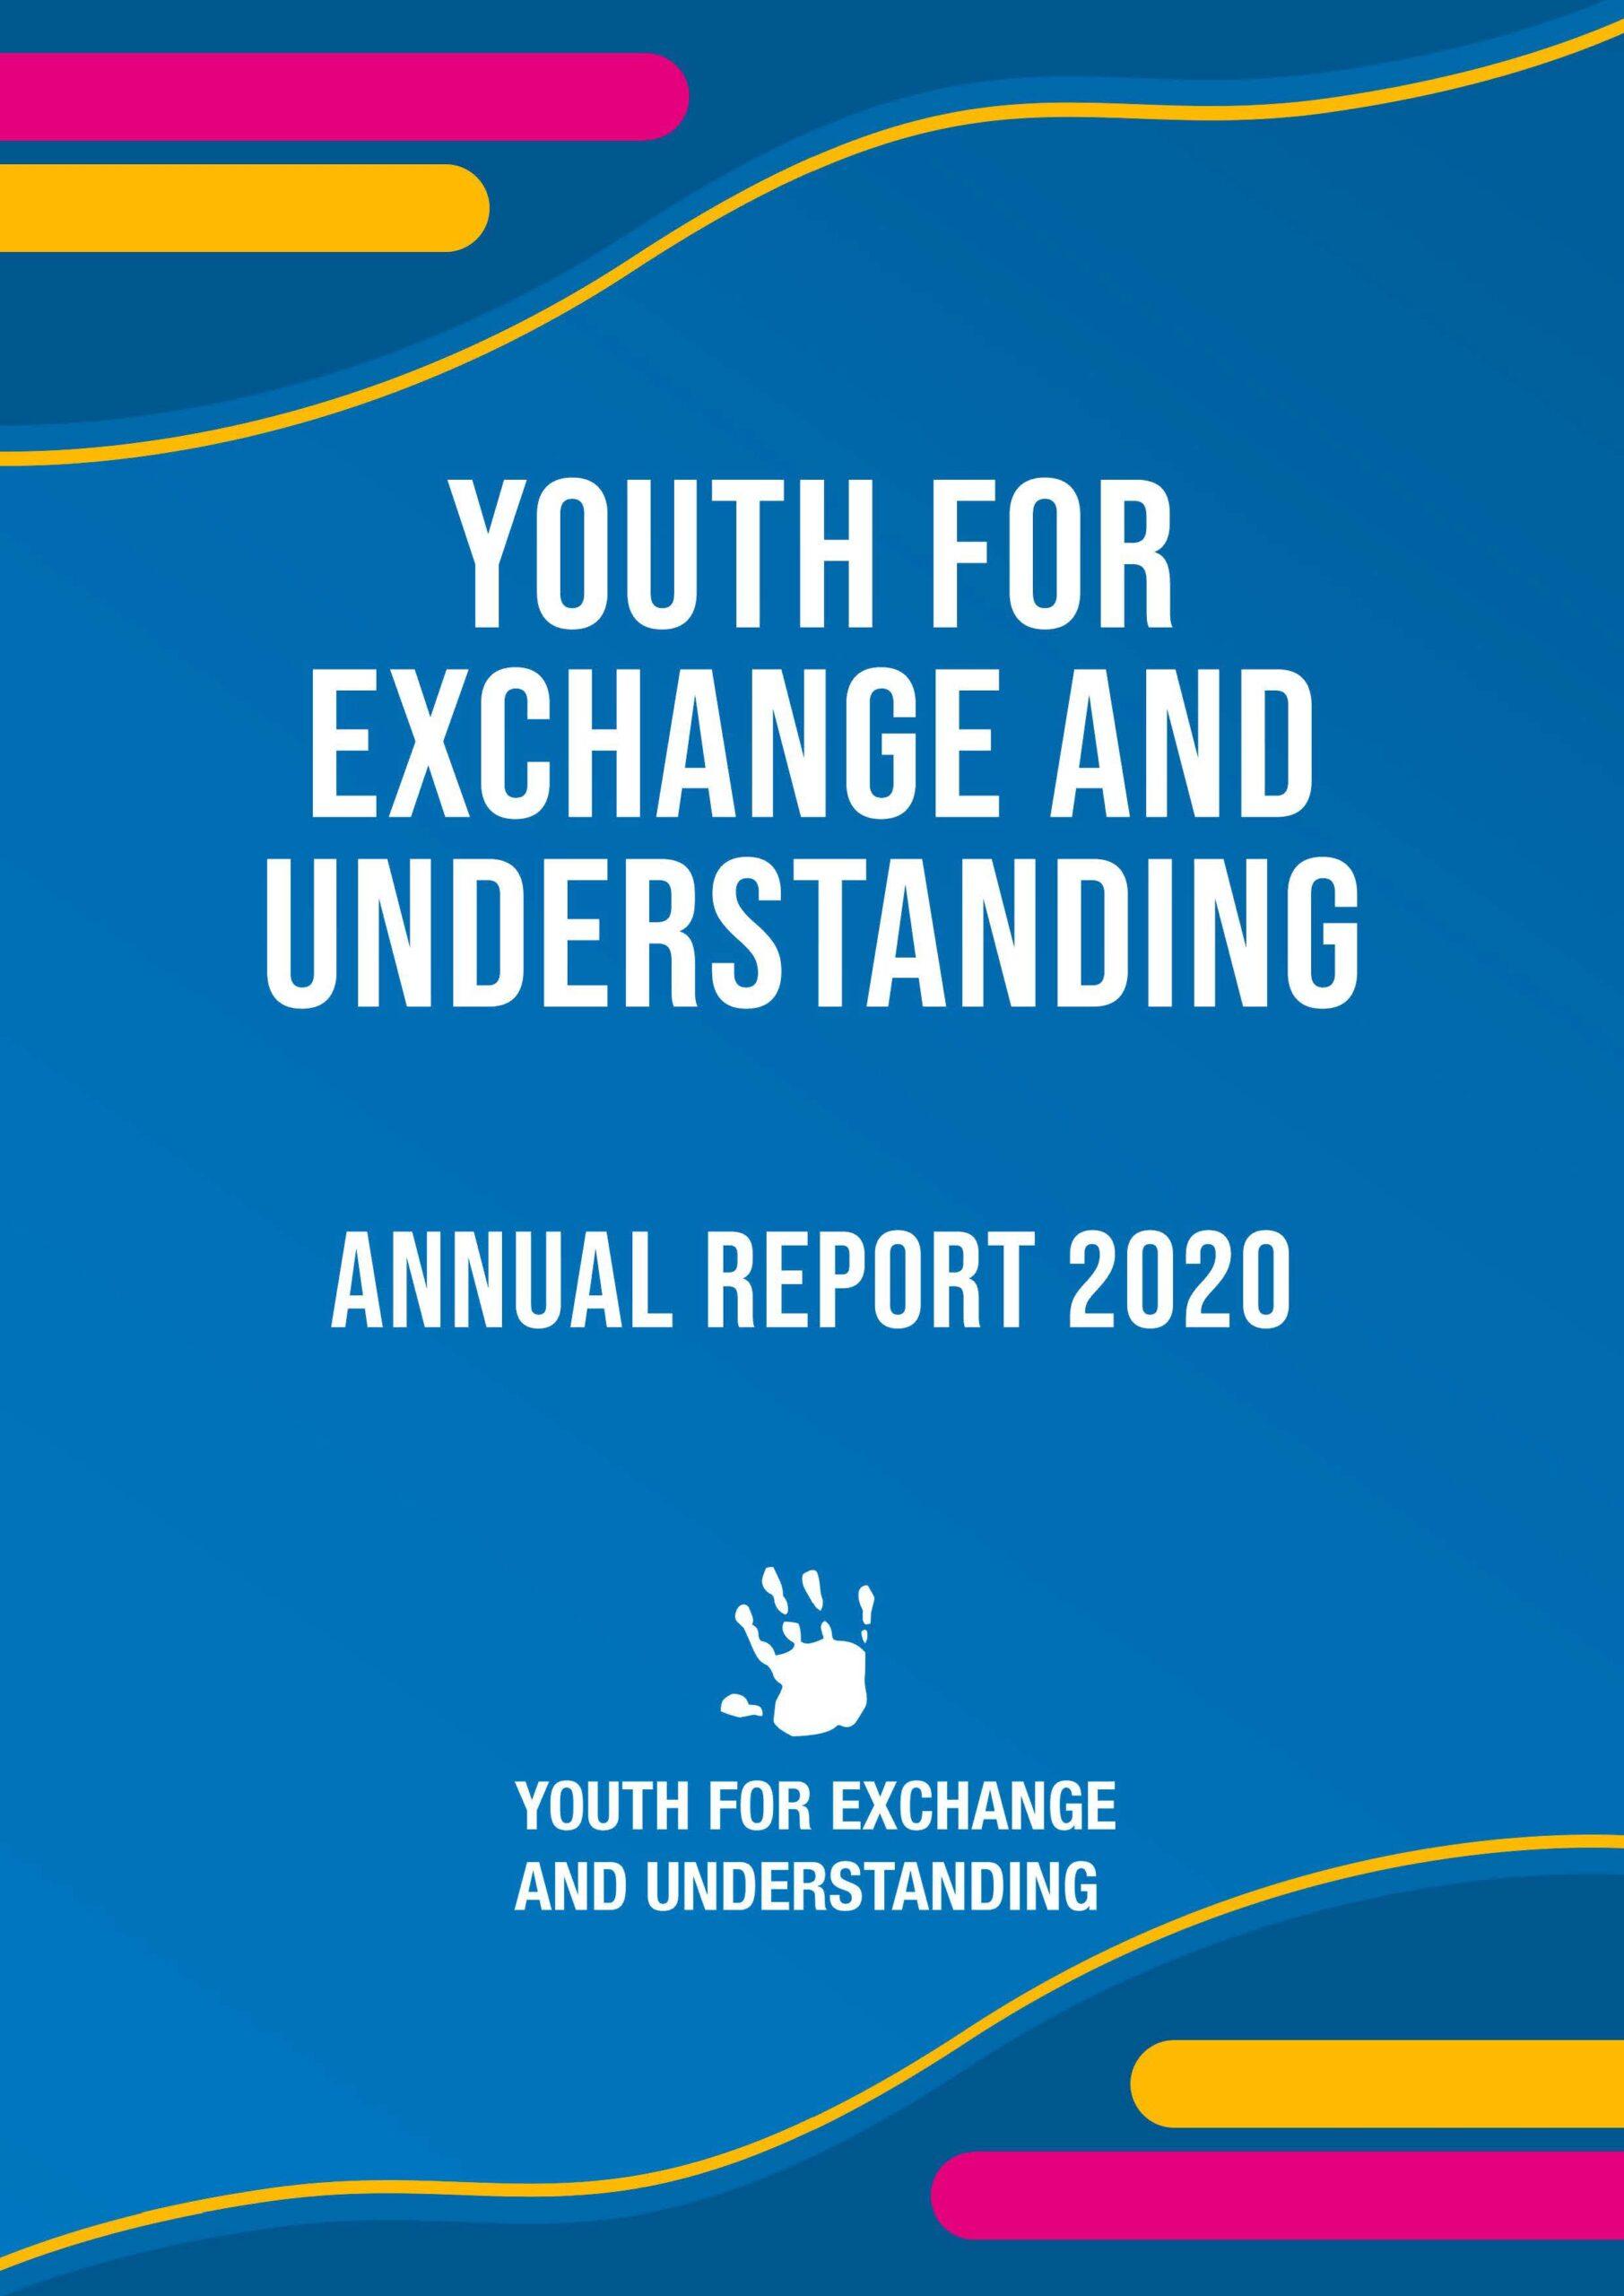 YEU Report 2020